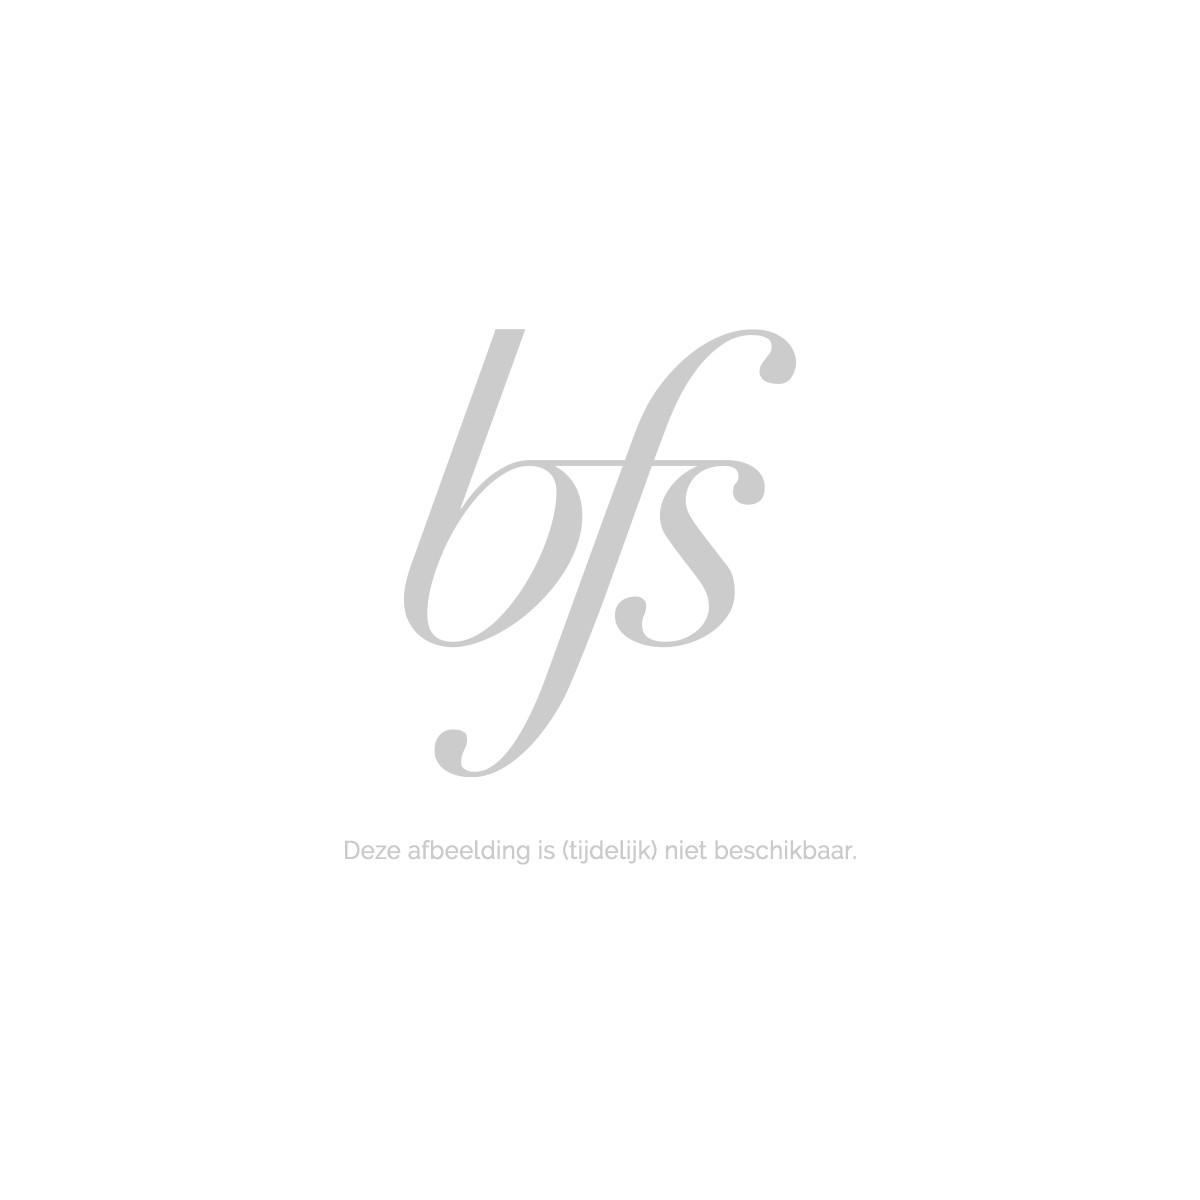 Collistar Gloss Design Inst. Vol. Long Last. Shine #1 Transparente 7 ml